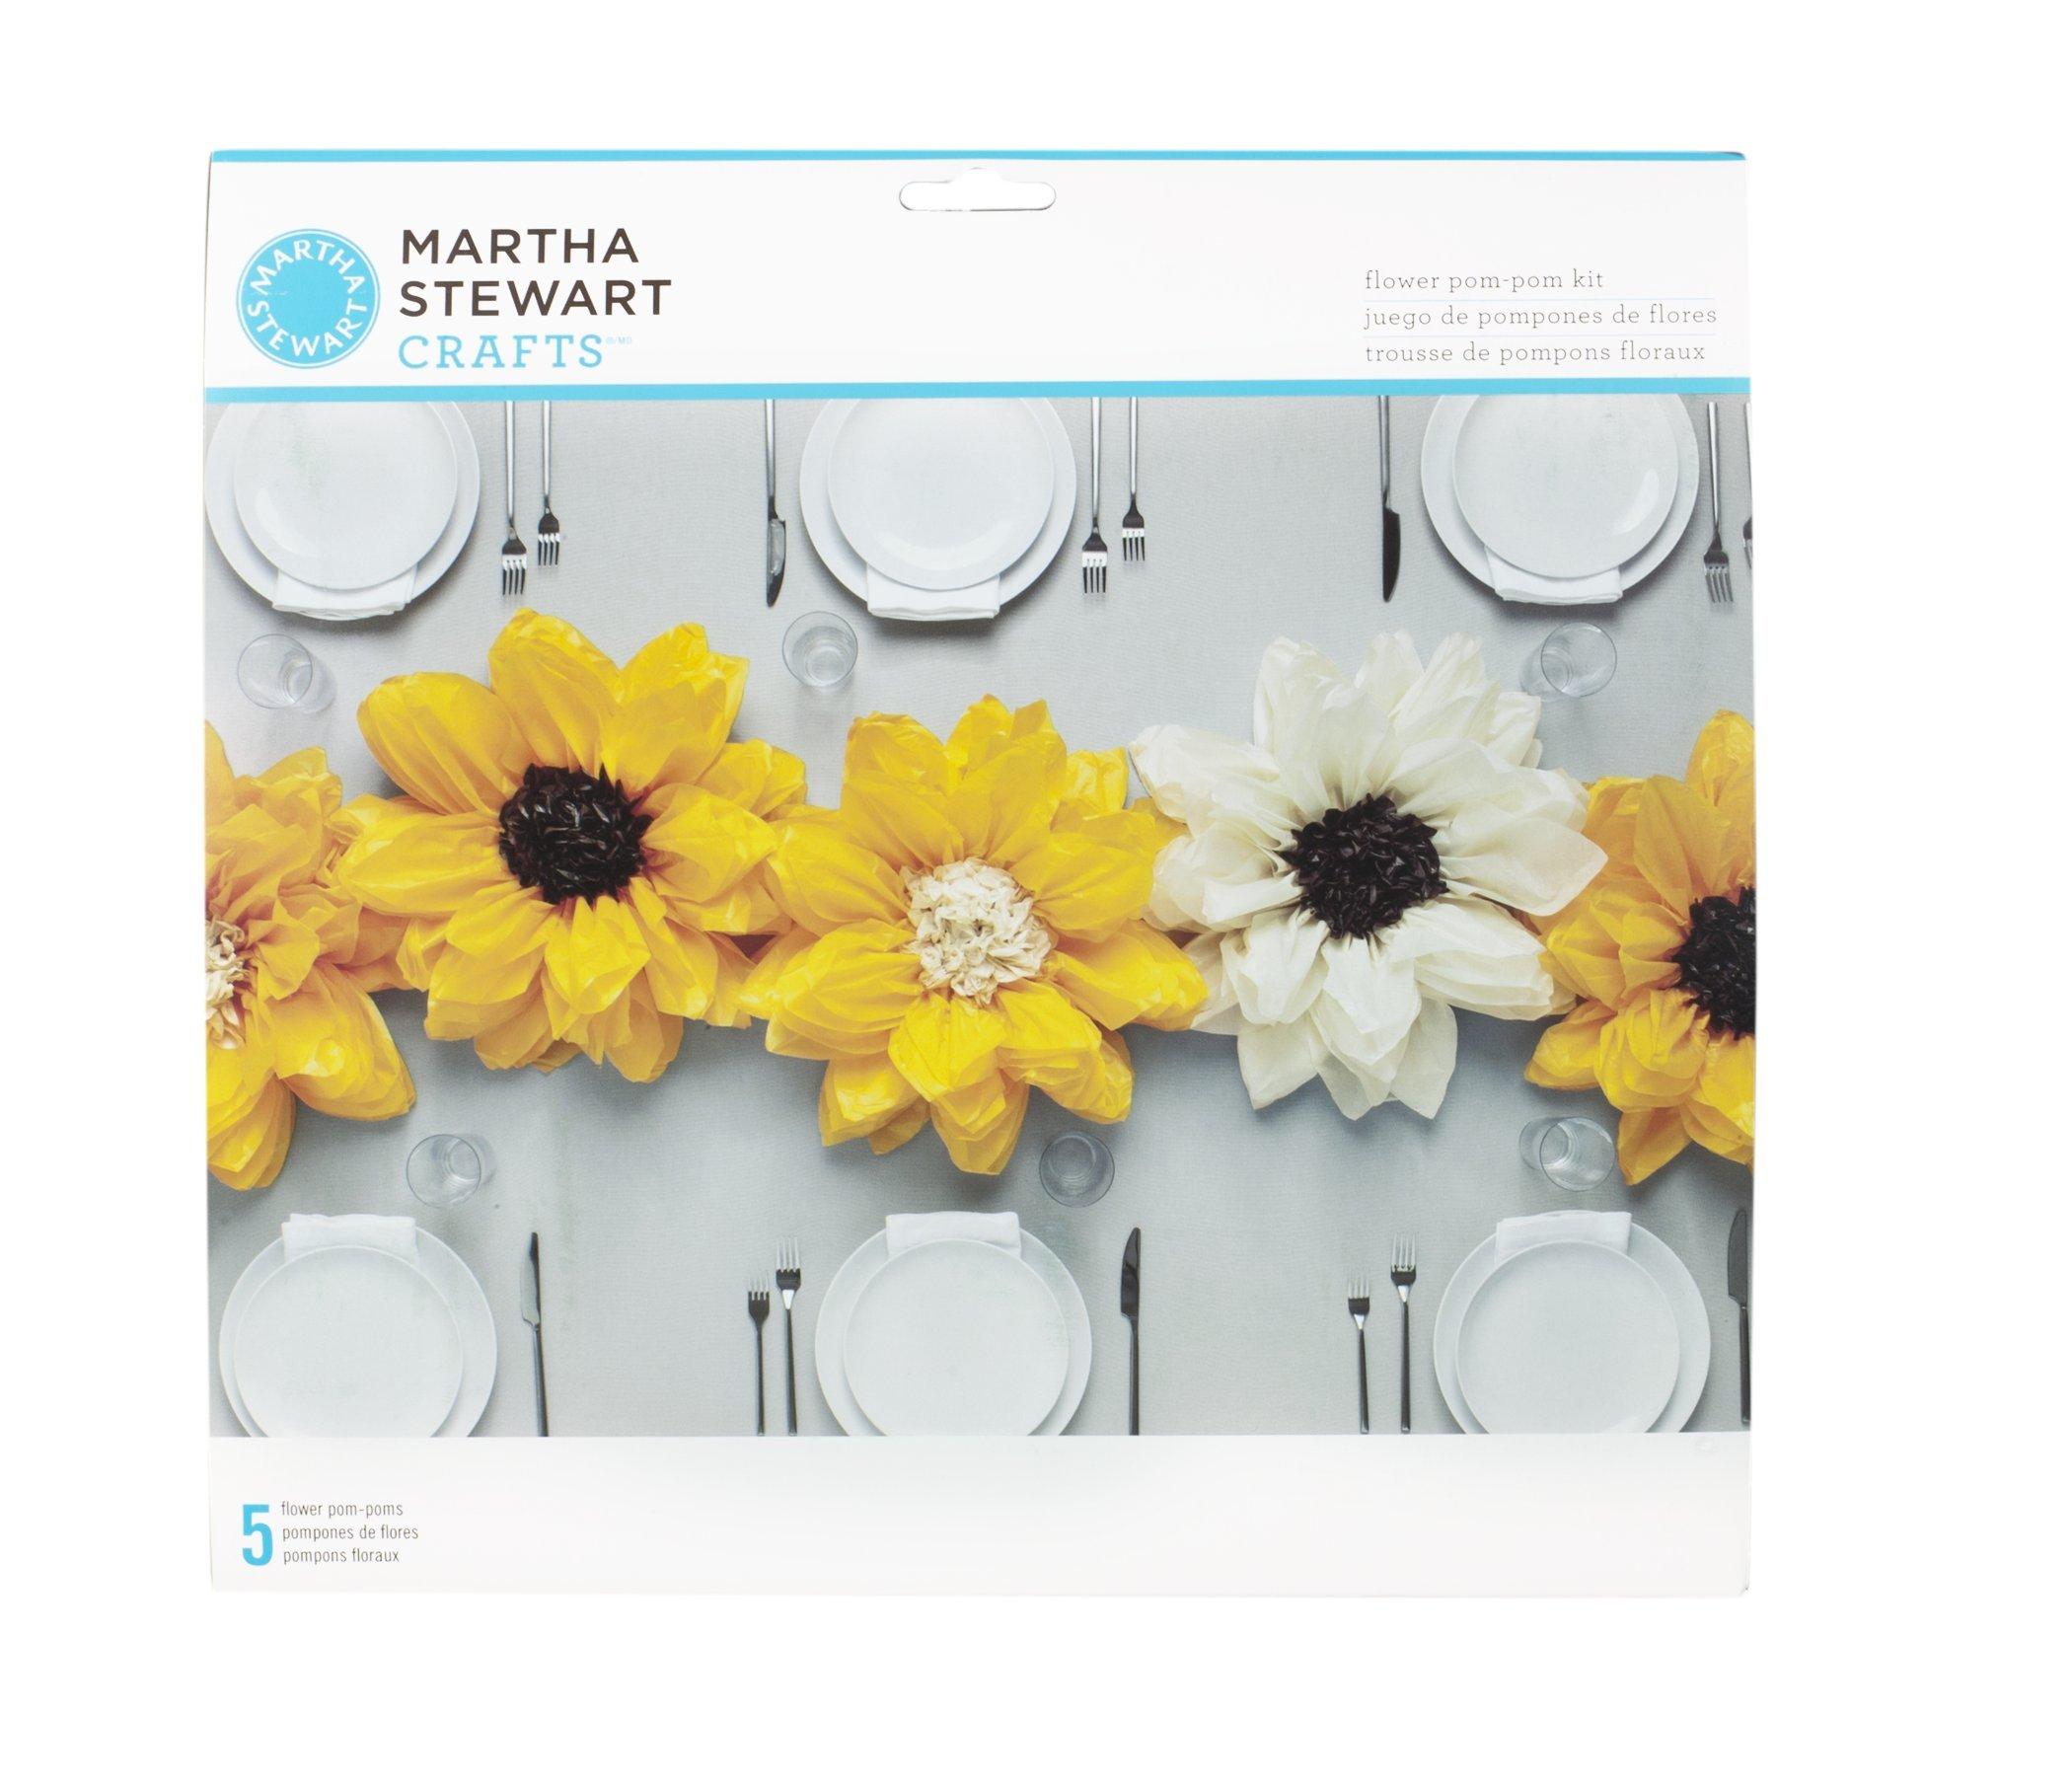 Martha Stewart Crafts 44-10220 Tissue Pom-Pom Kit, Black-Eyed Susan Flowers, Yellow